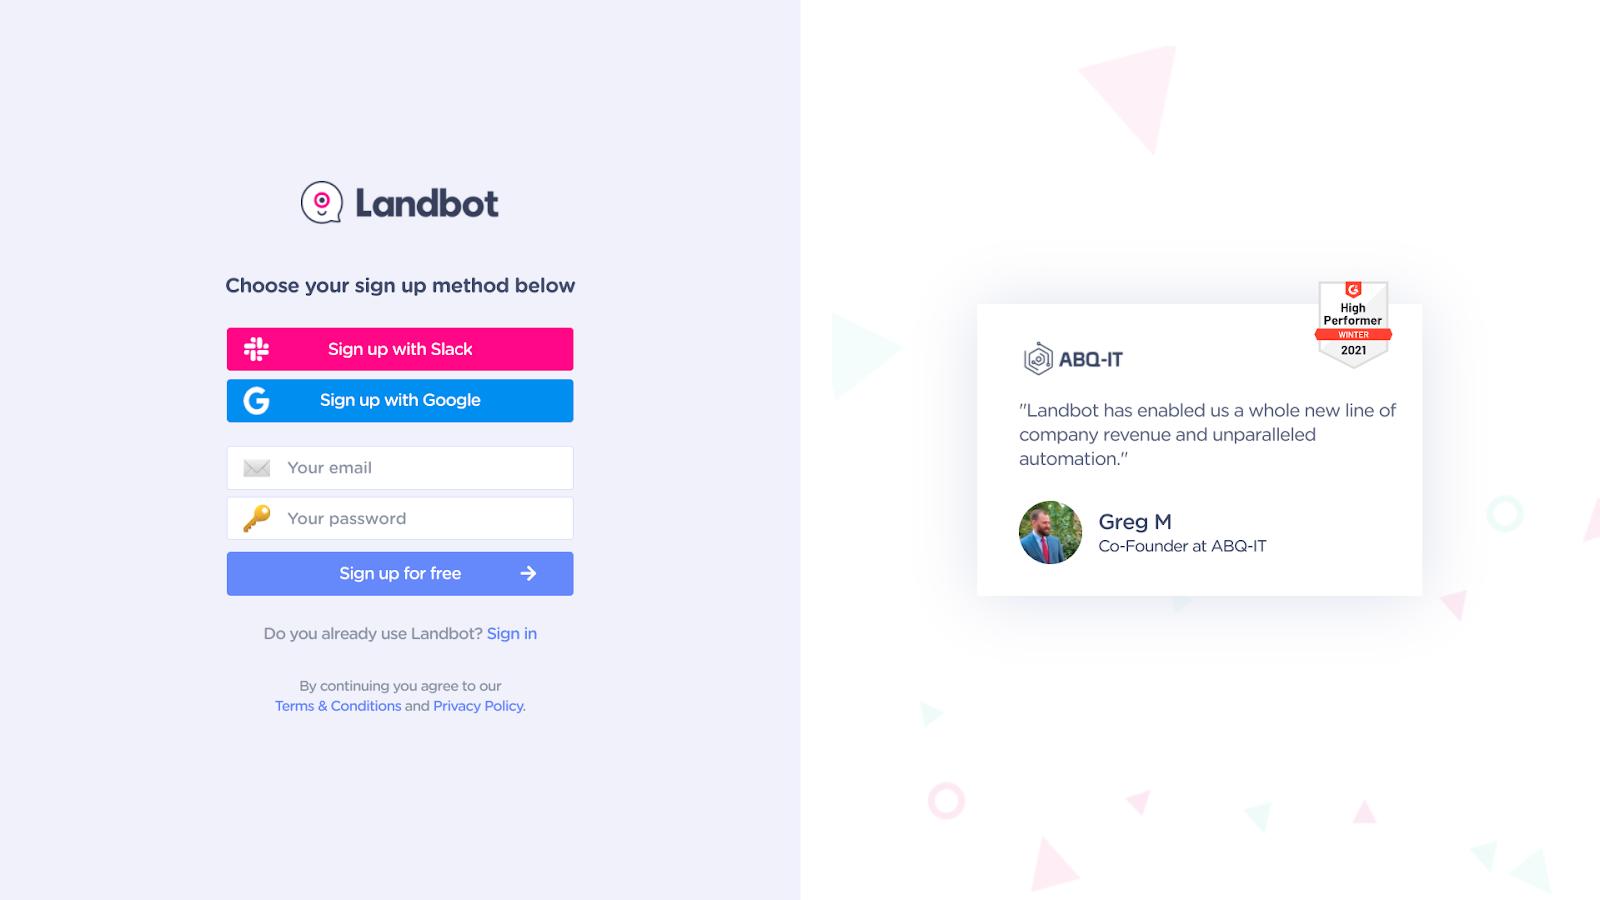 A screenshot of Landbot's sign-up page.